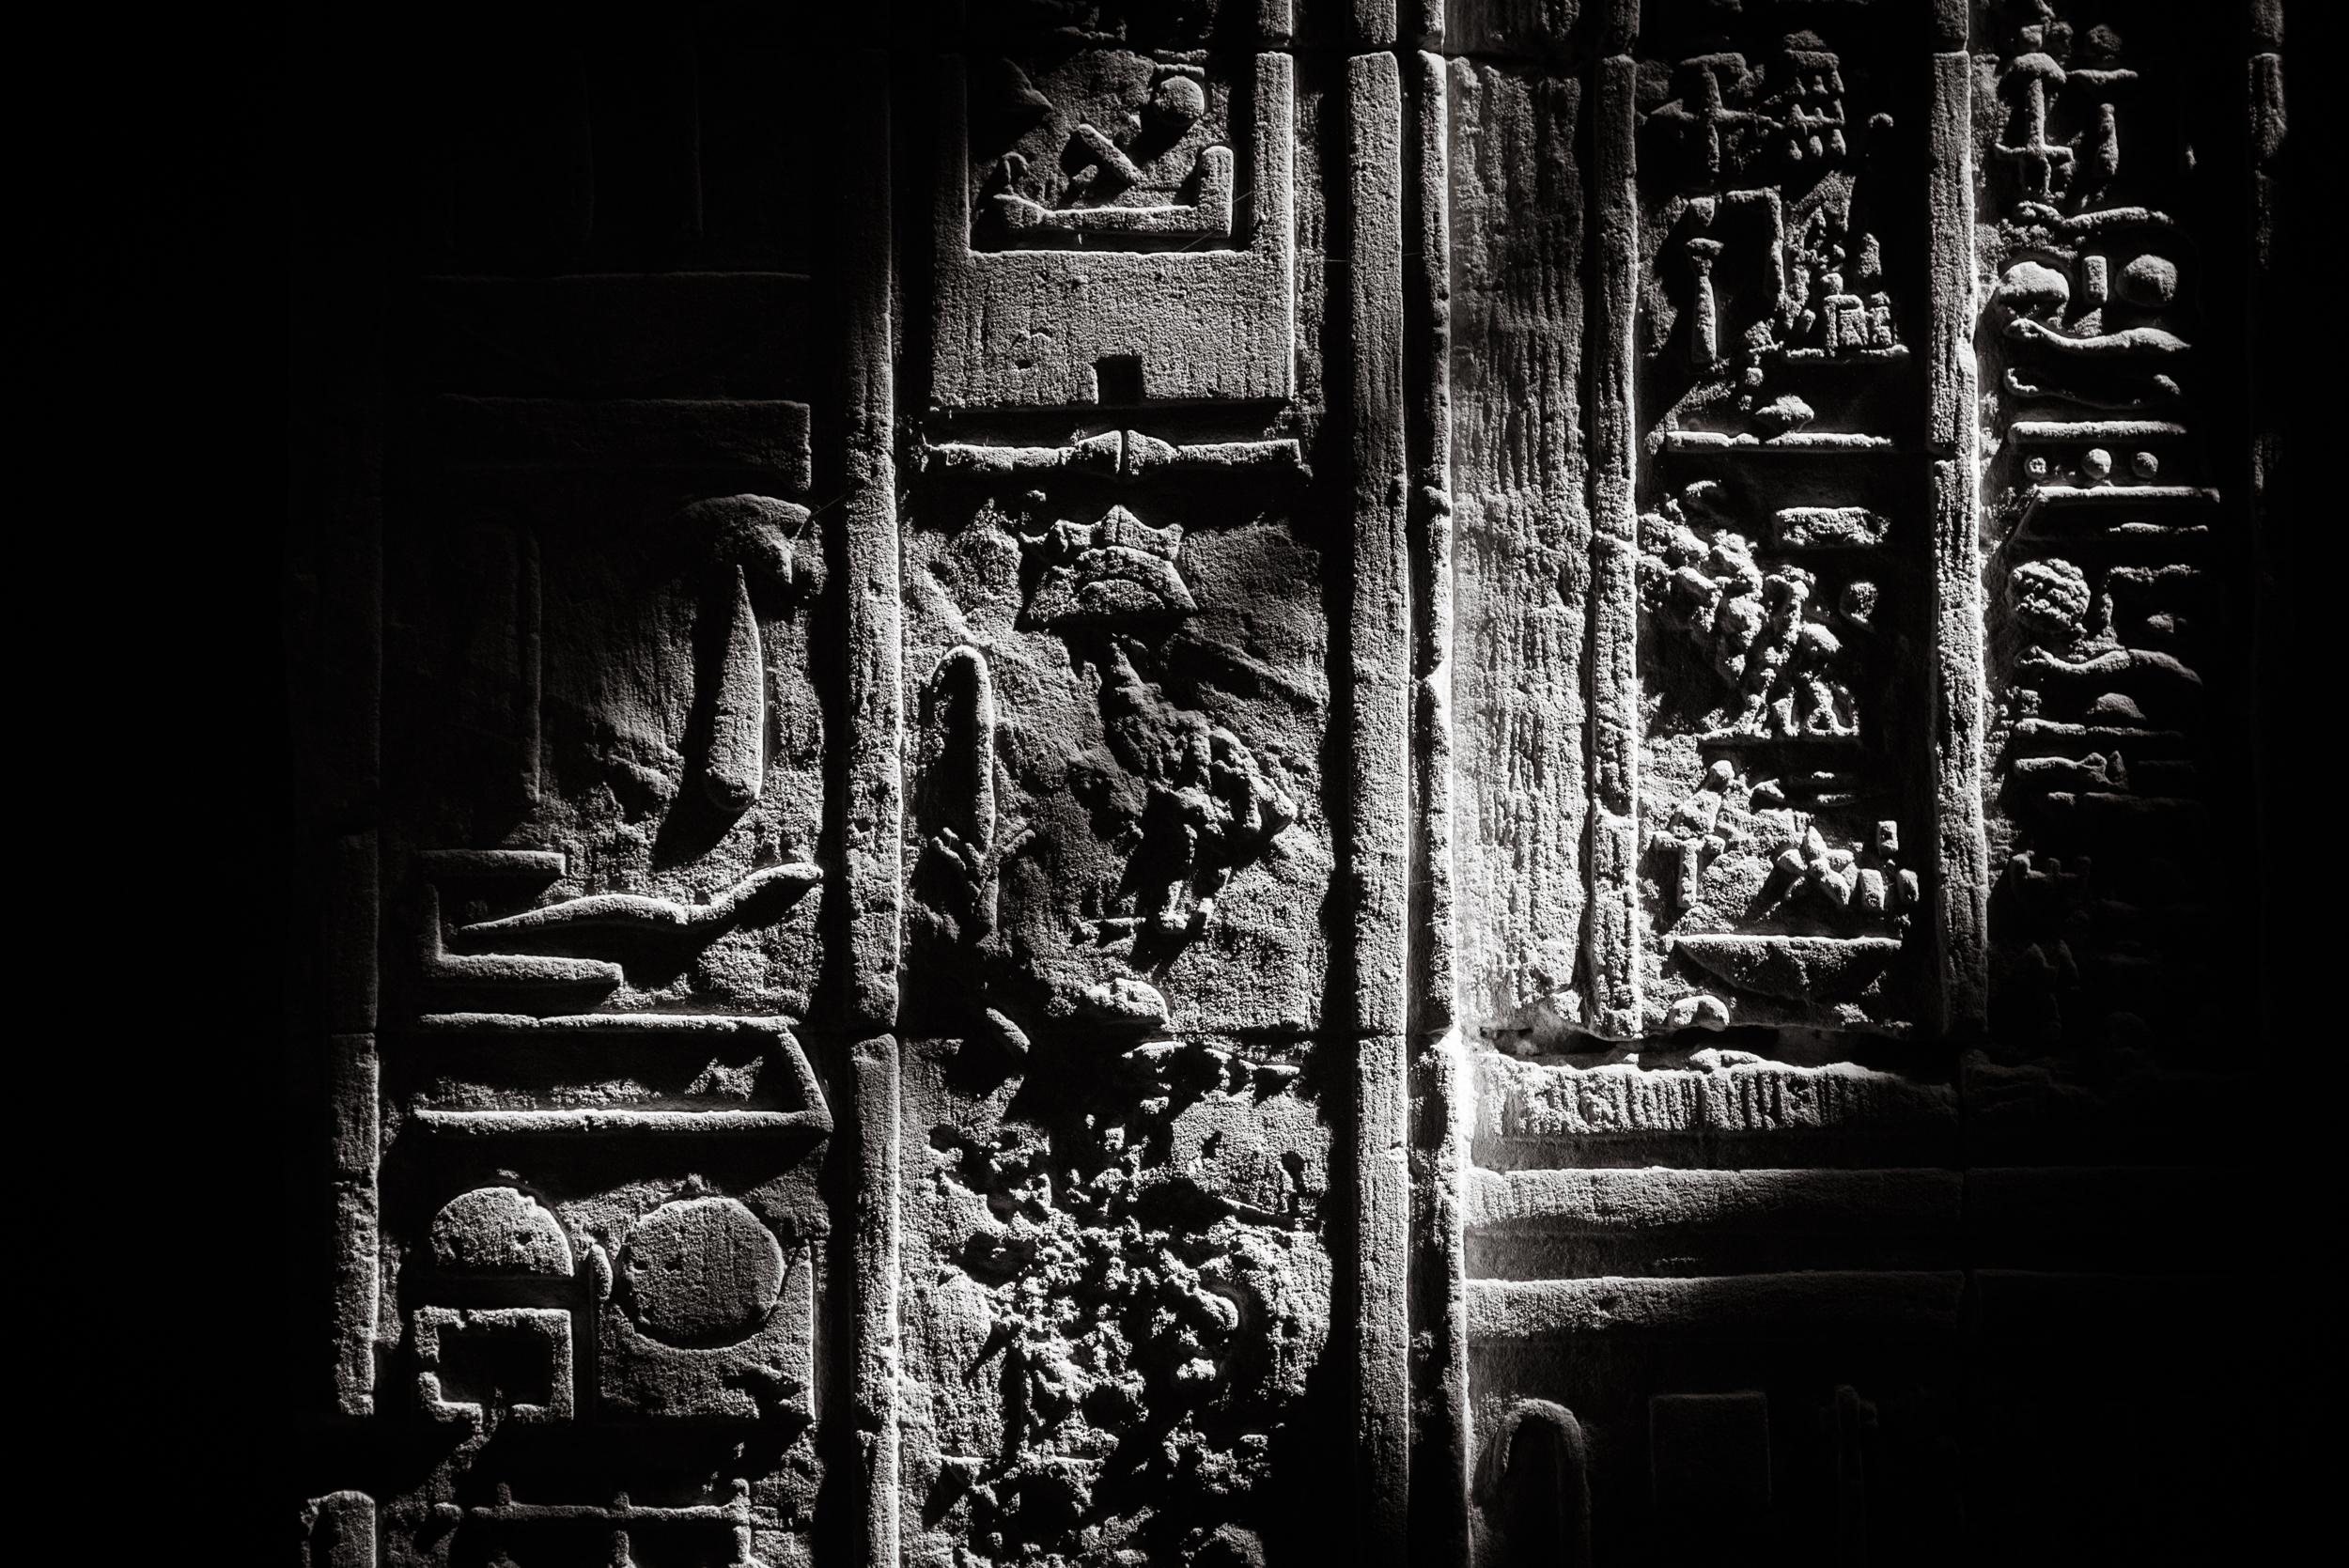 Egypt_Capturecraft-Richard Luu Photo-12.jpg